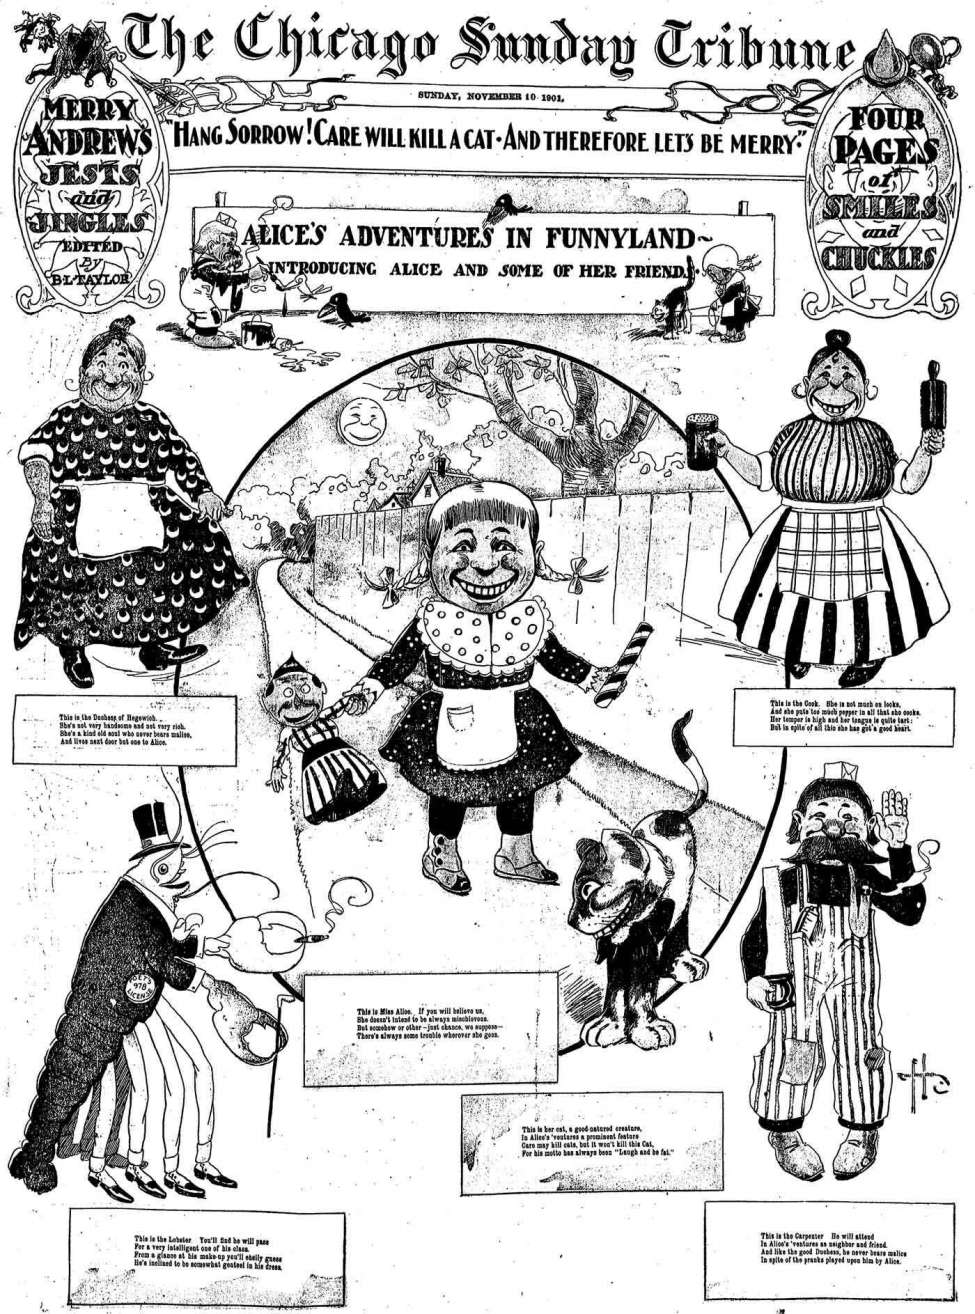 comic-en-diarios-chicago-sunday-tribune-alice-adventures-in-funnyland